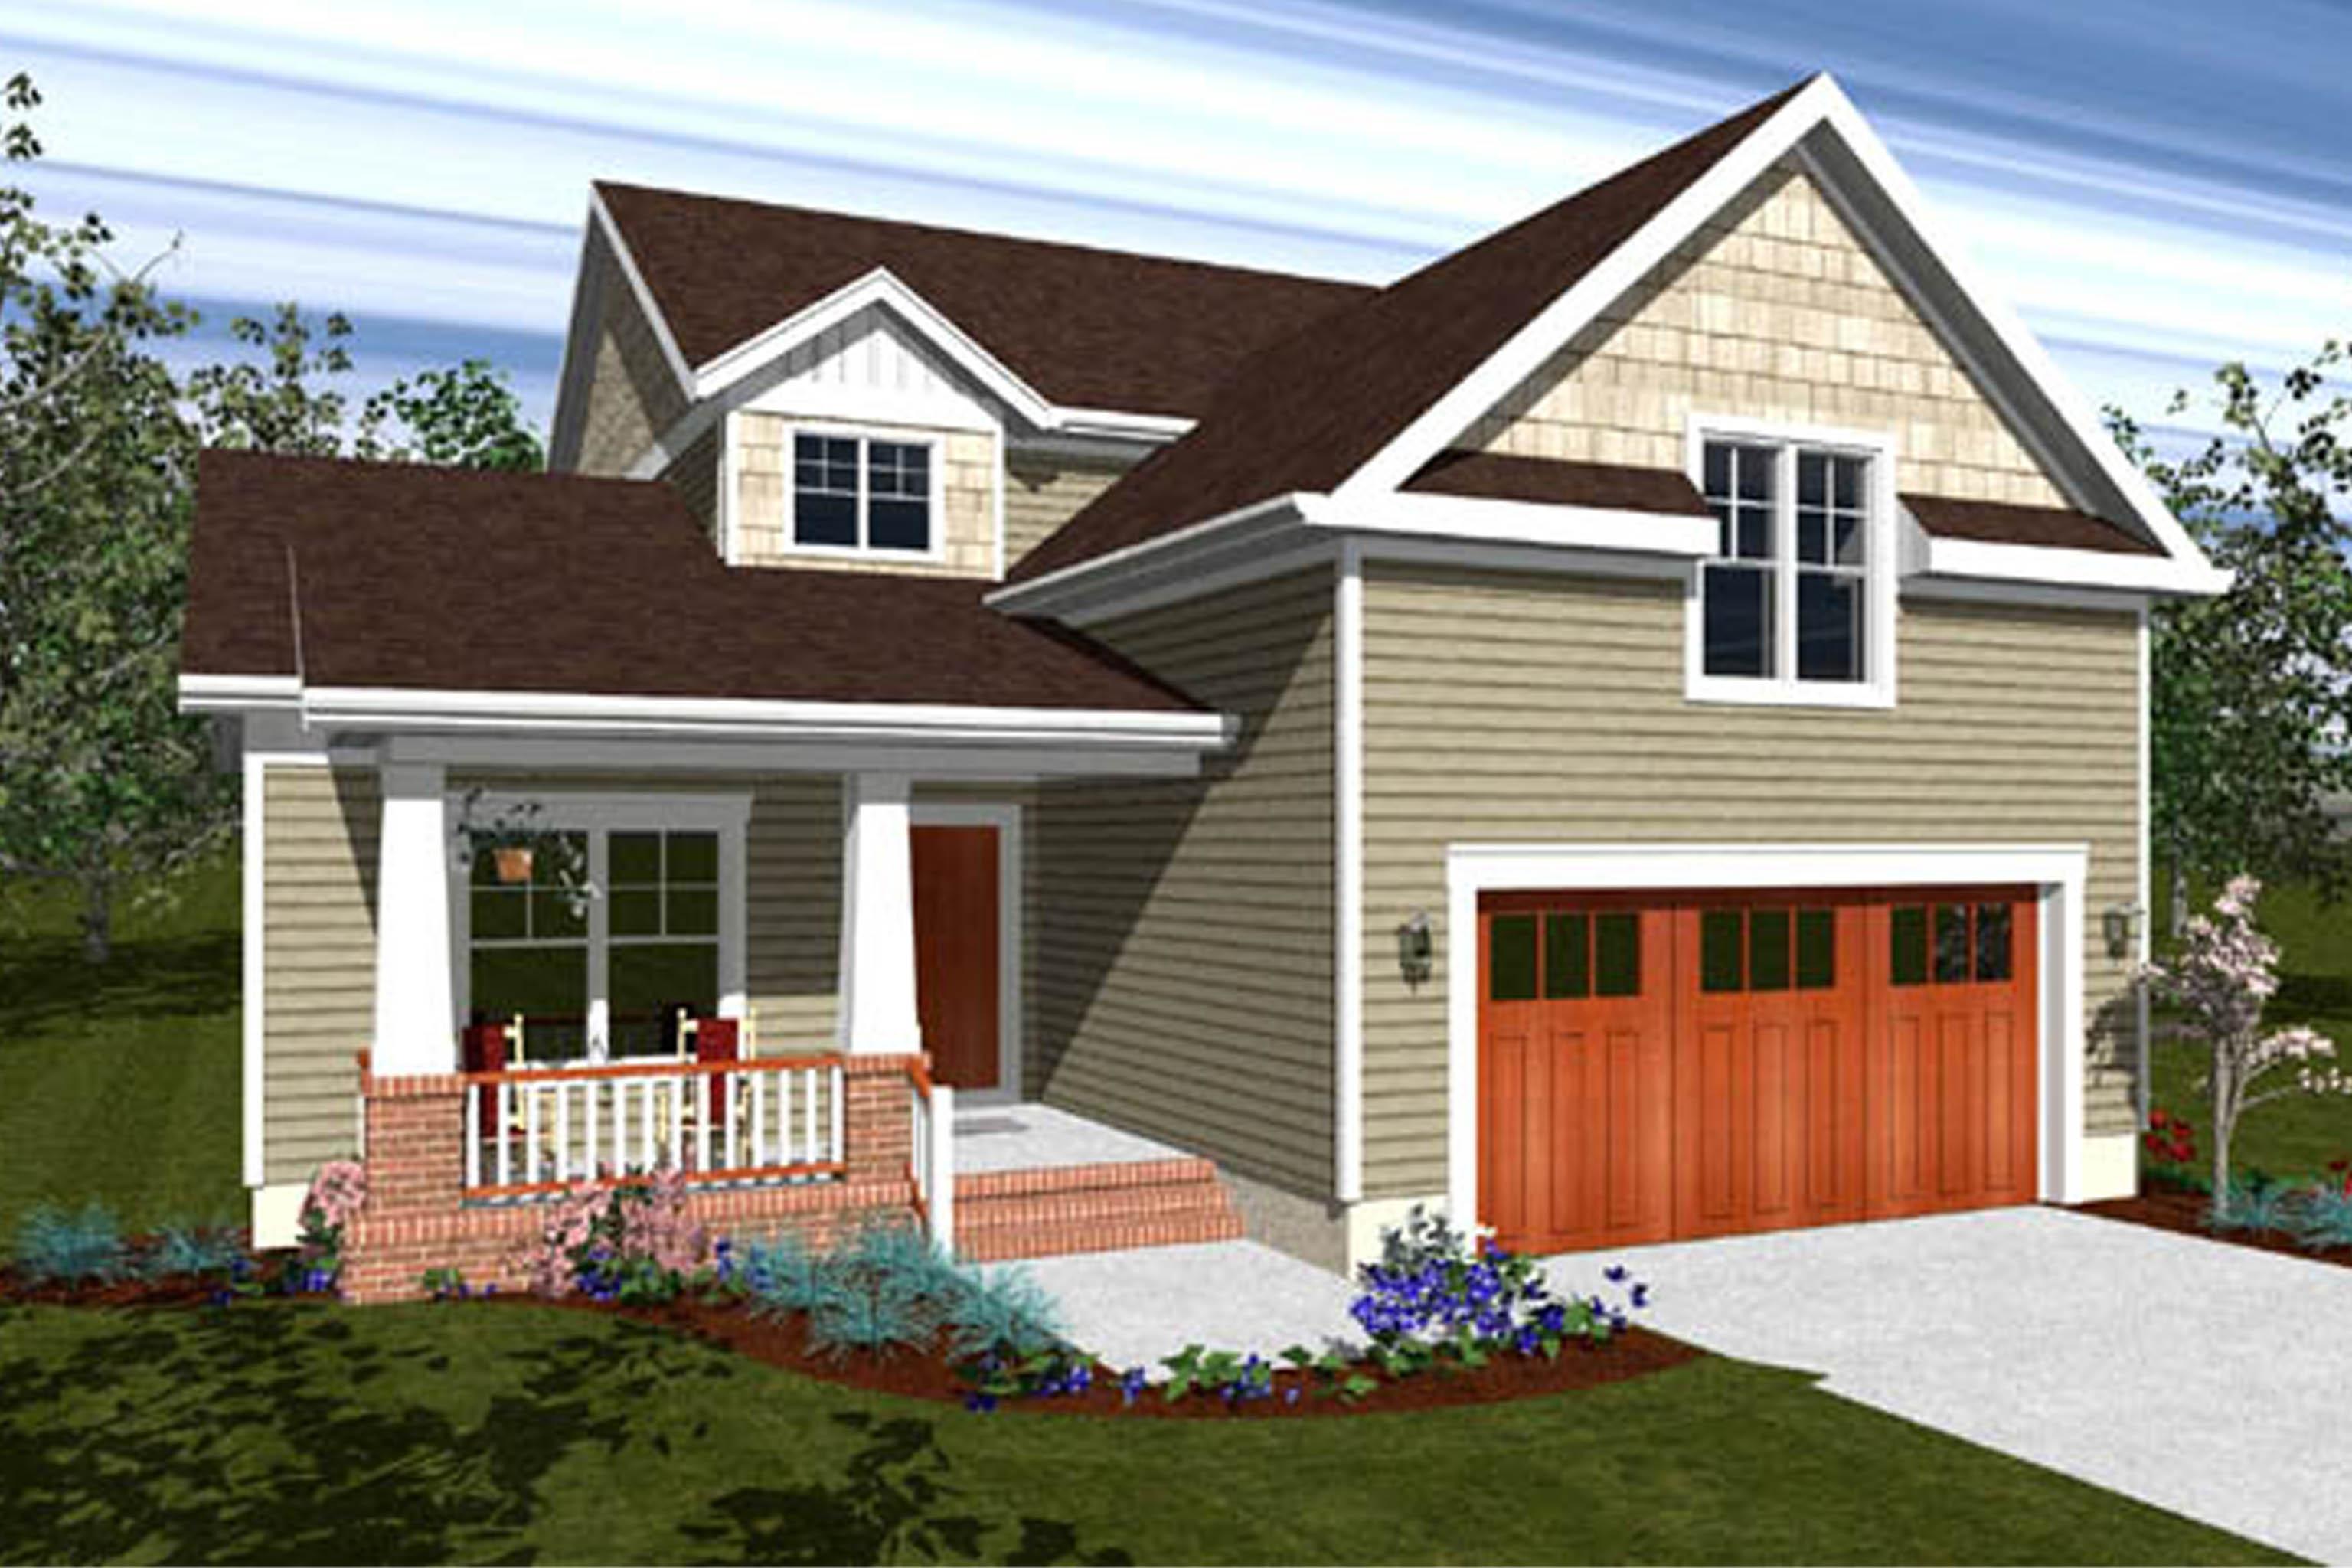 House Plan 196 - Stickley II